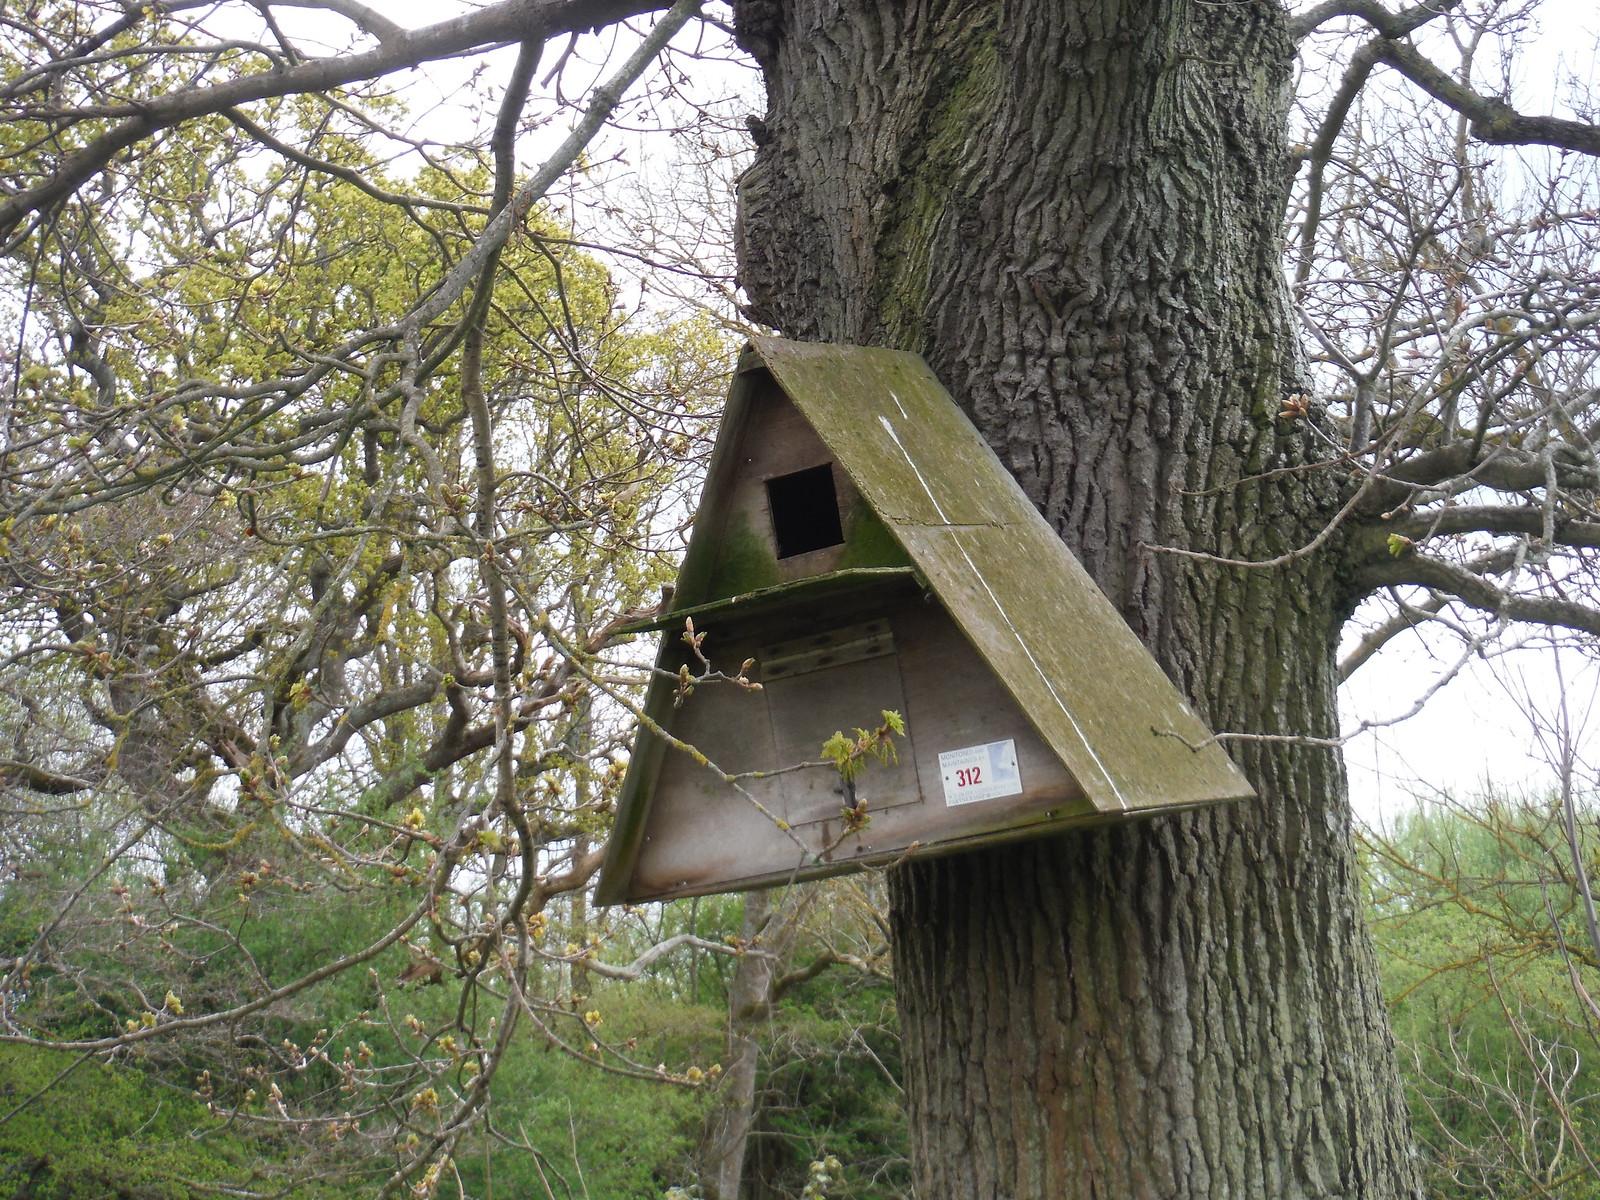 Barn Owl Nesting Box SWC Walk 272 Uckfield to Lewes